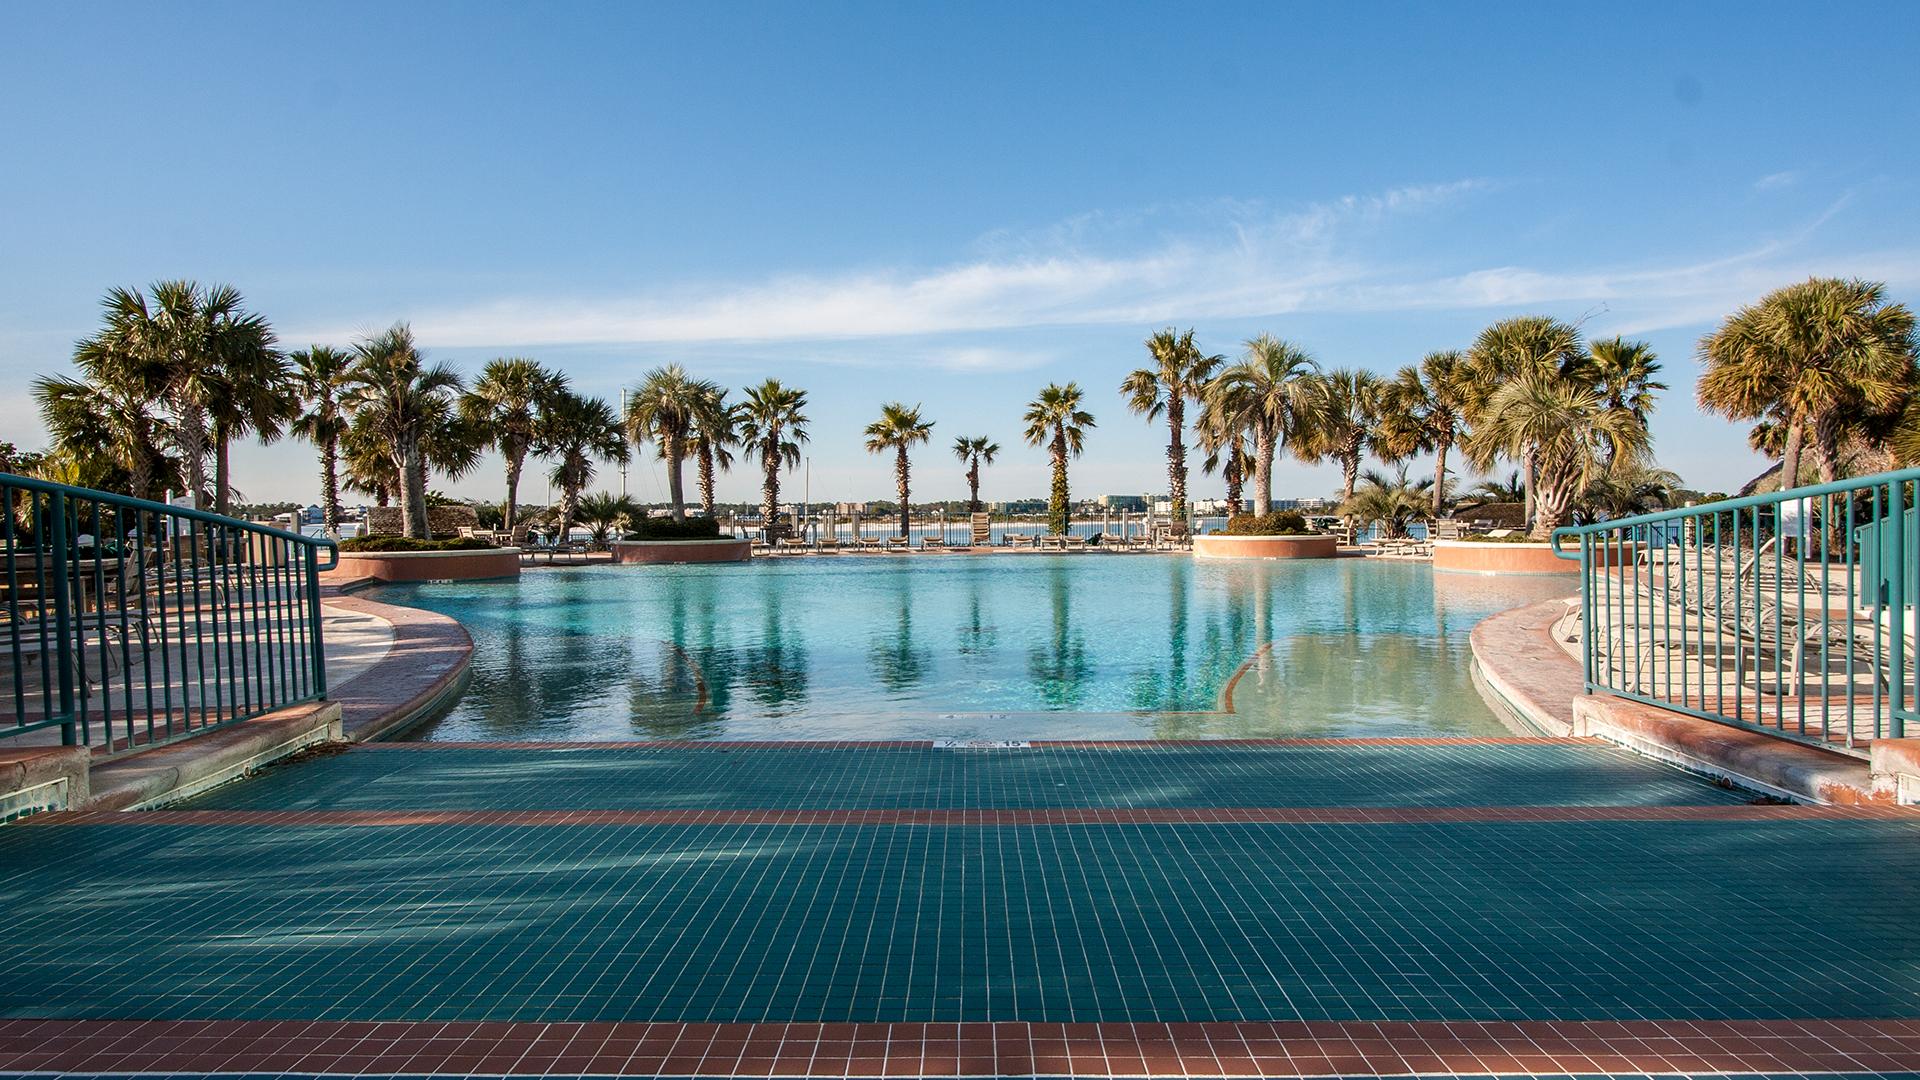 Caribe Resort Poolside